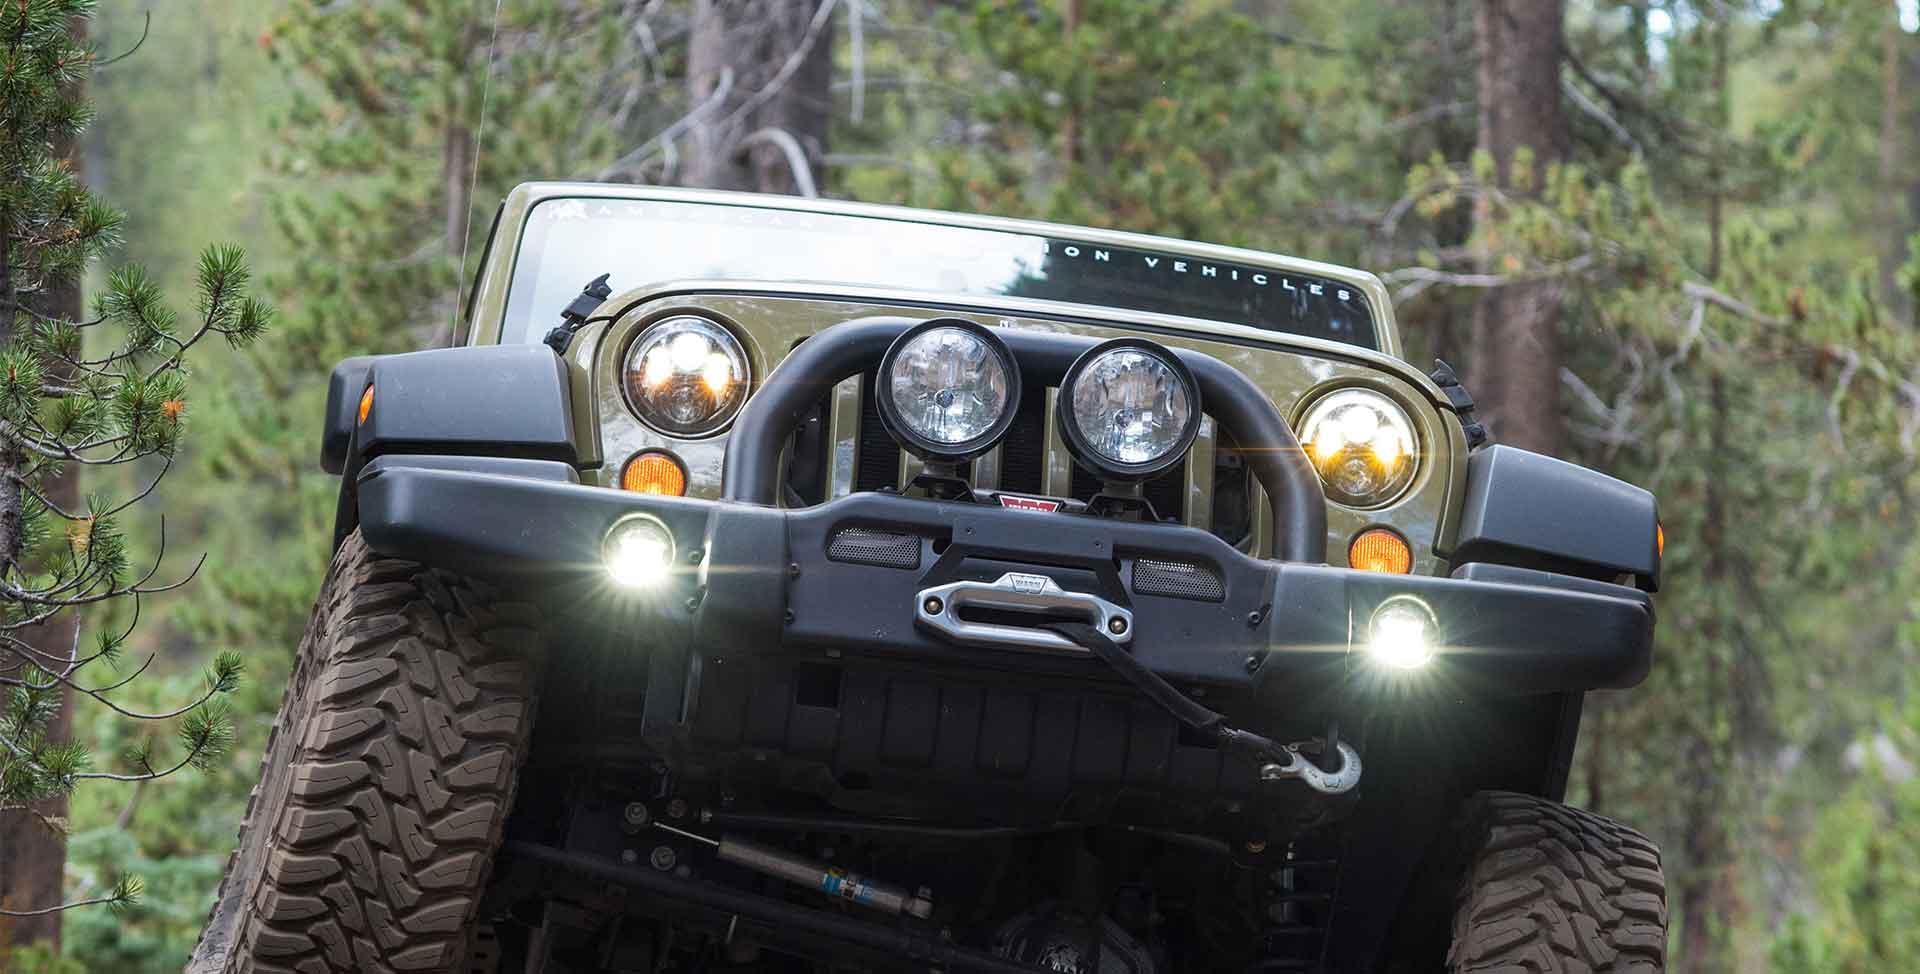 Wrangler Jk Hilift Pull Pal Mount American Expedition Vehicles Jeep Premium Front Bumper